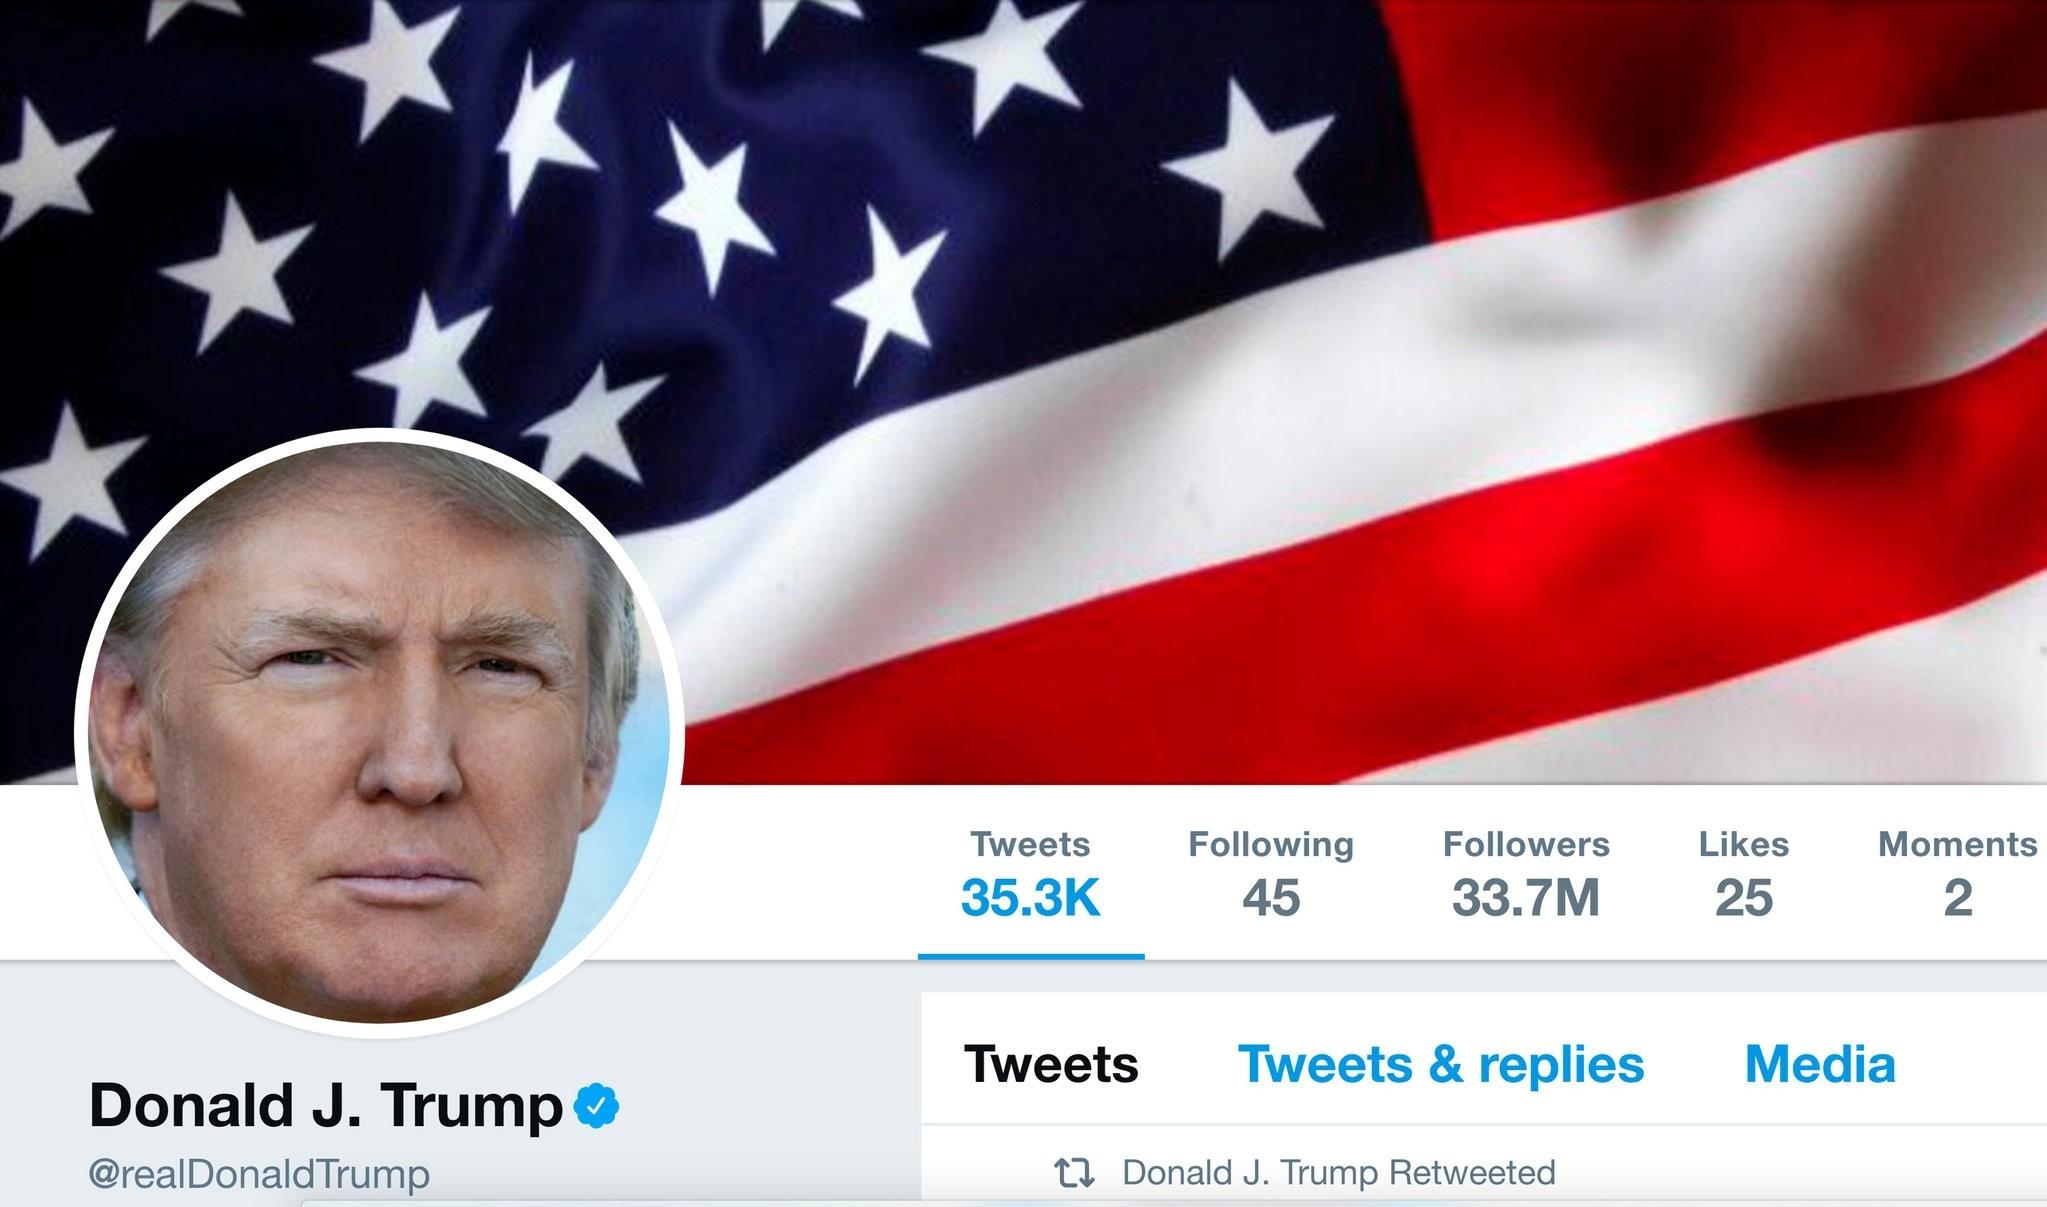 The masthead of U.S. President Donald Trump's @realDonaldTrump Twitter account is seen on July 11, 2017. (Handout via REUTERS)